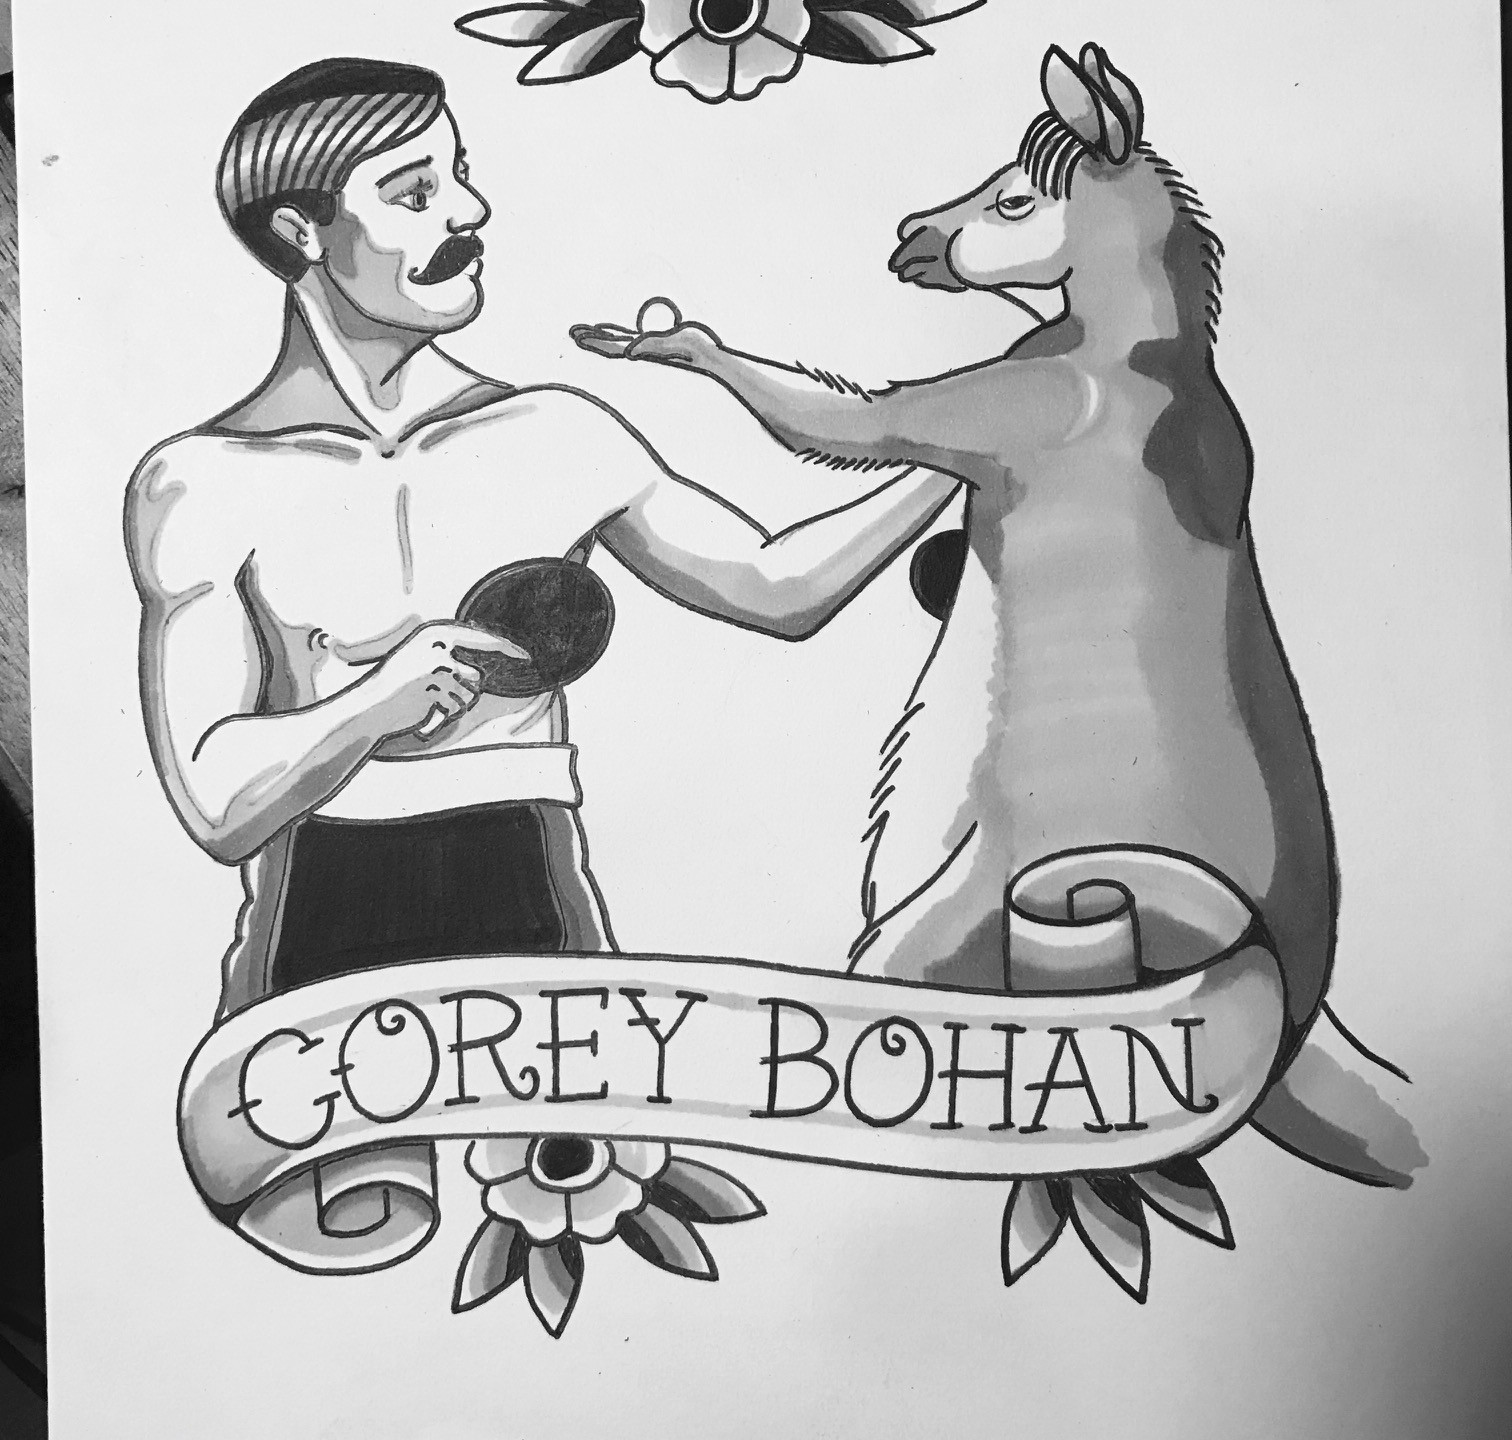 Corey Bohan vs Kangaroo